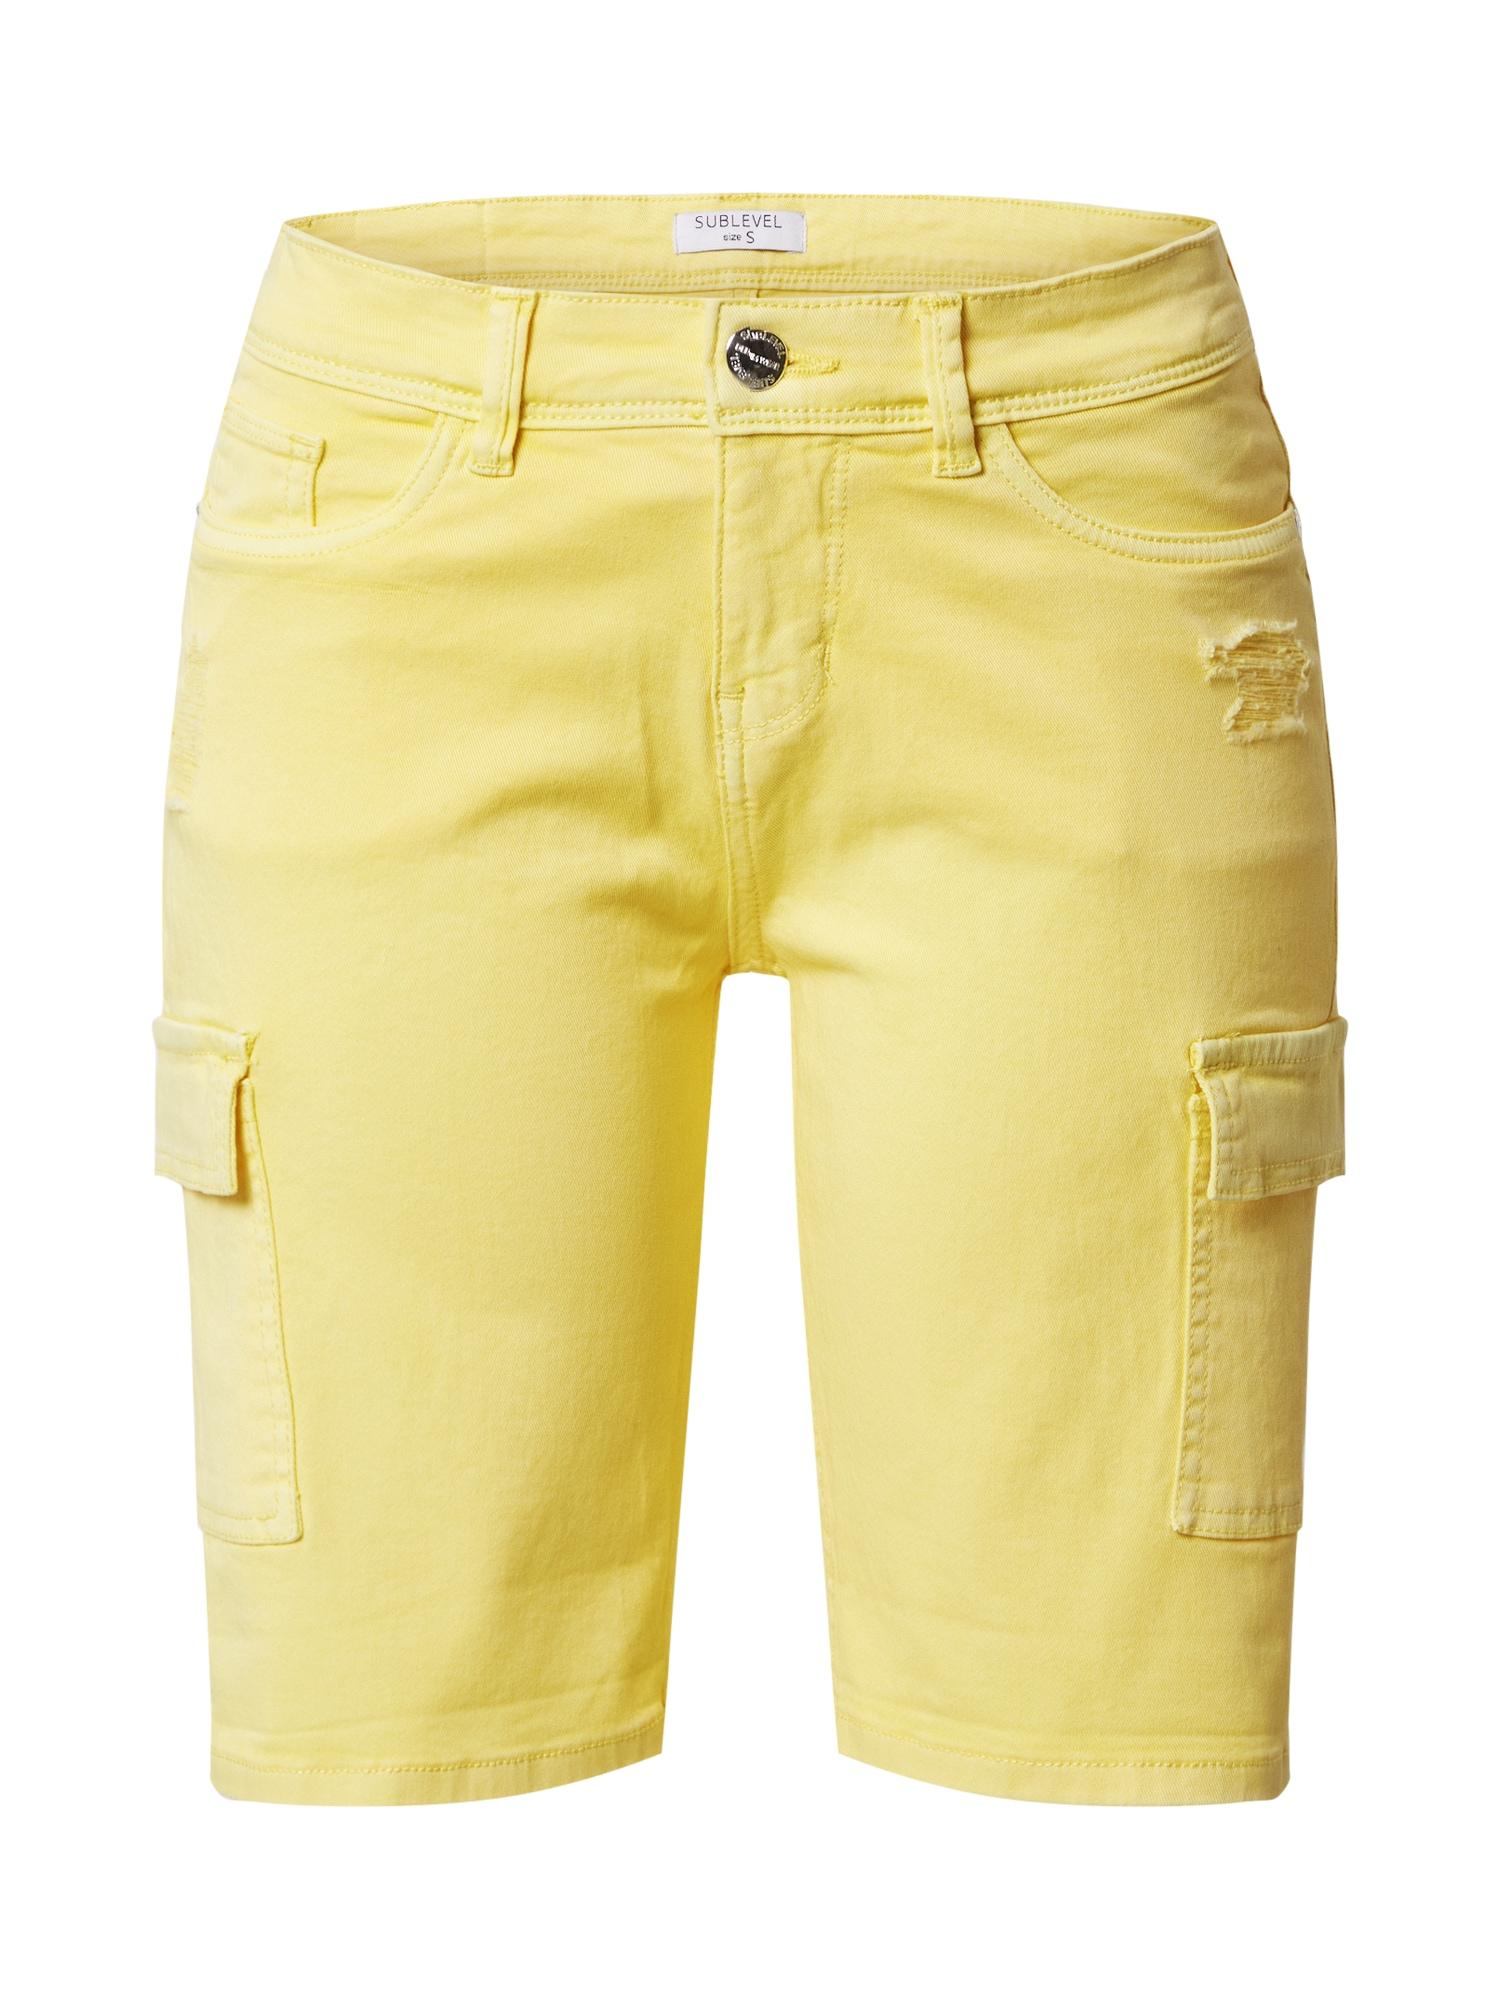 Sublevel Laisvo stiliaus kelnės geltona